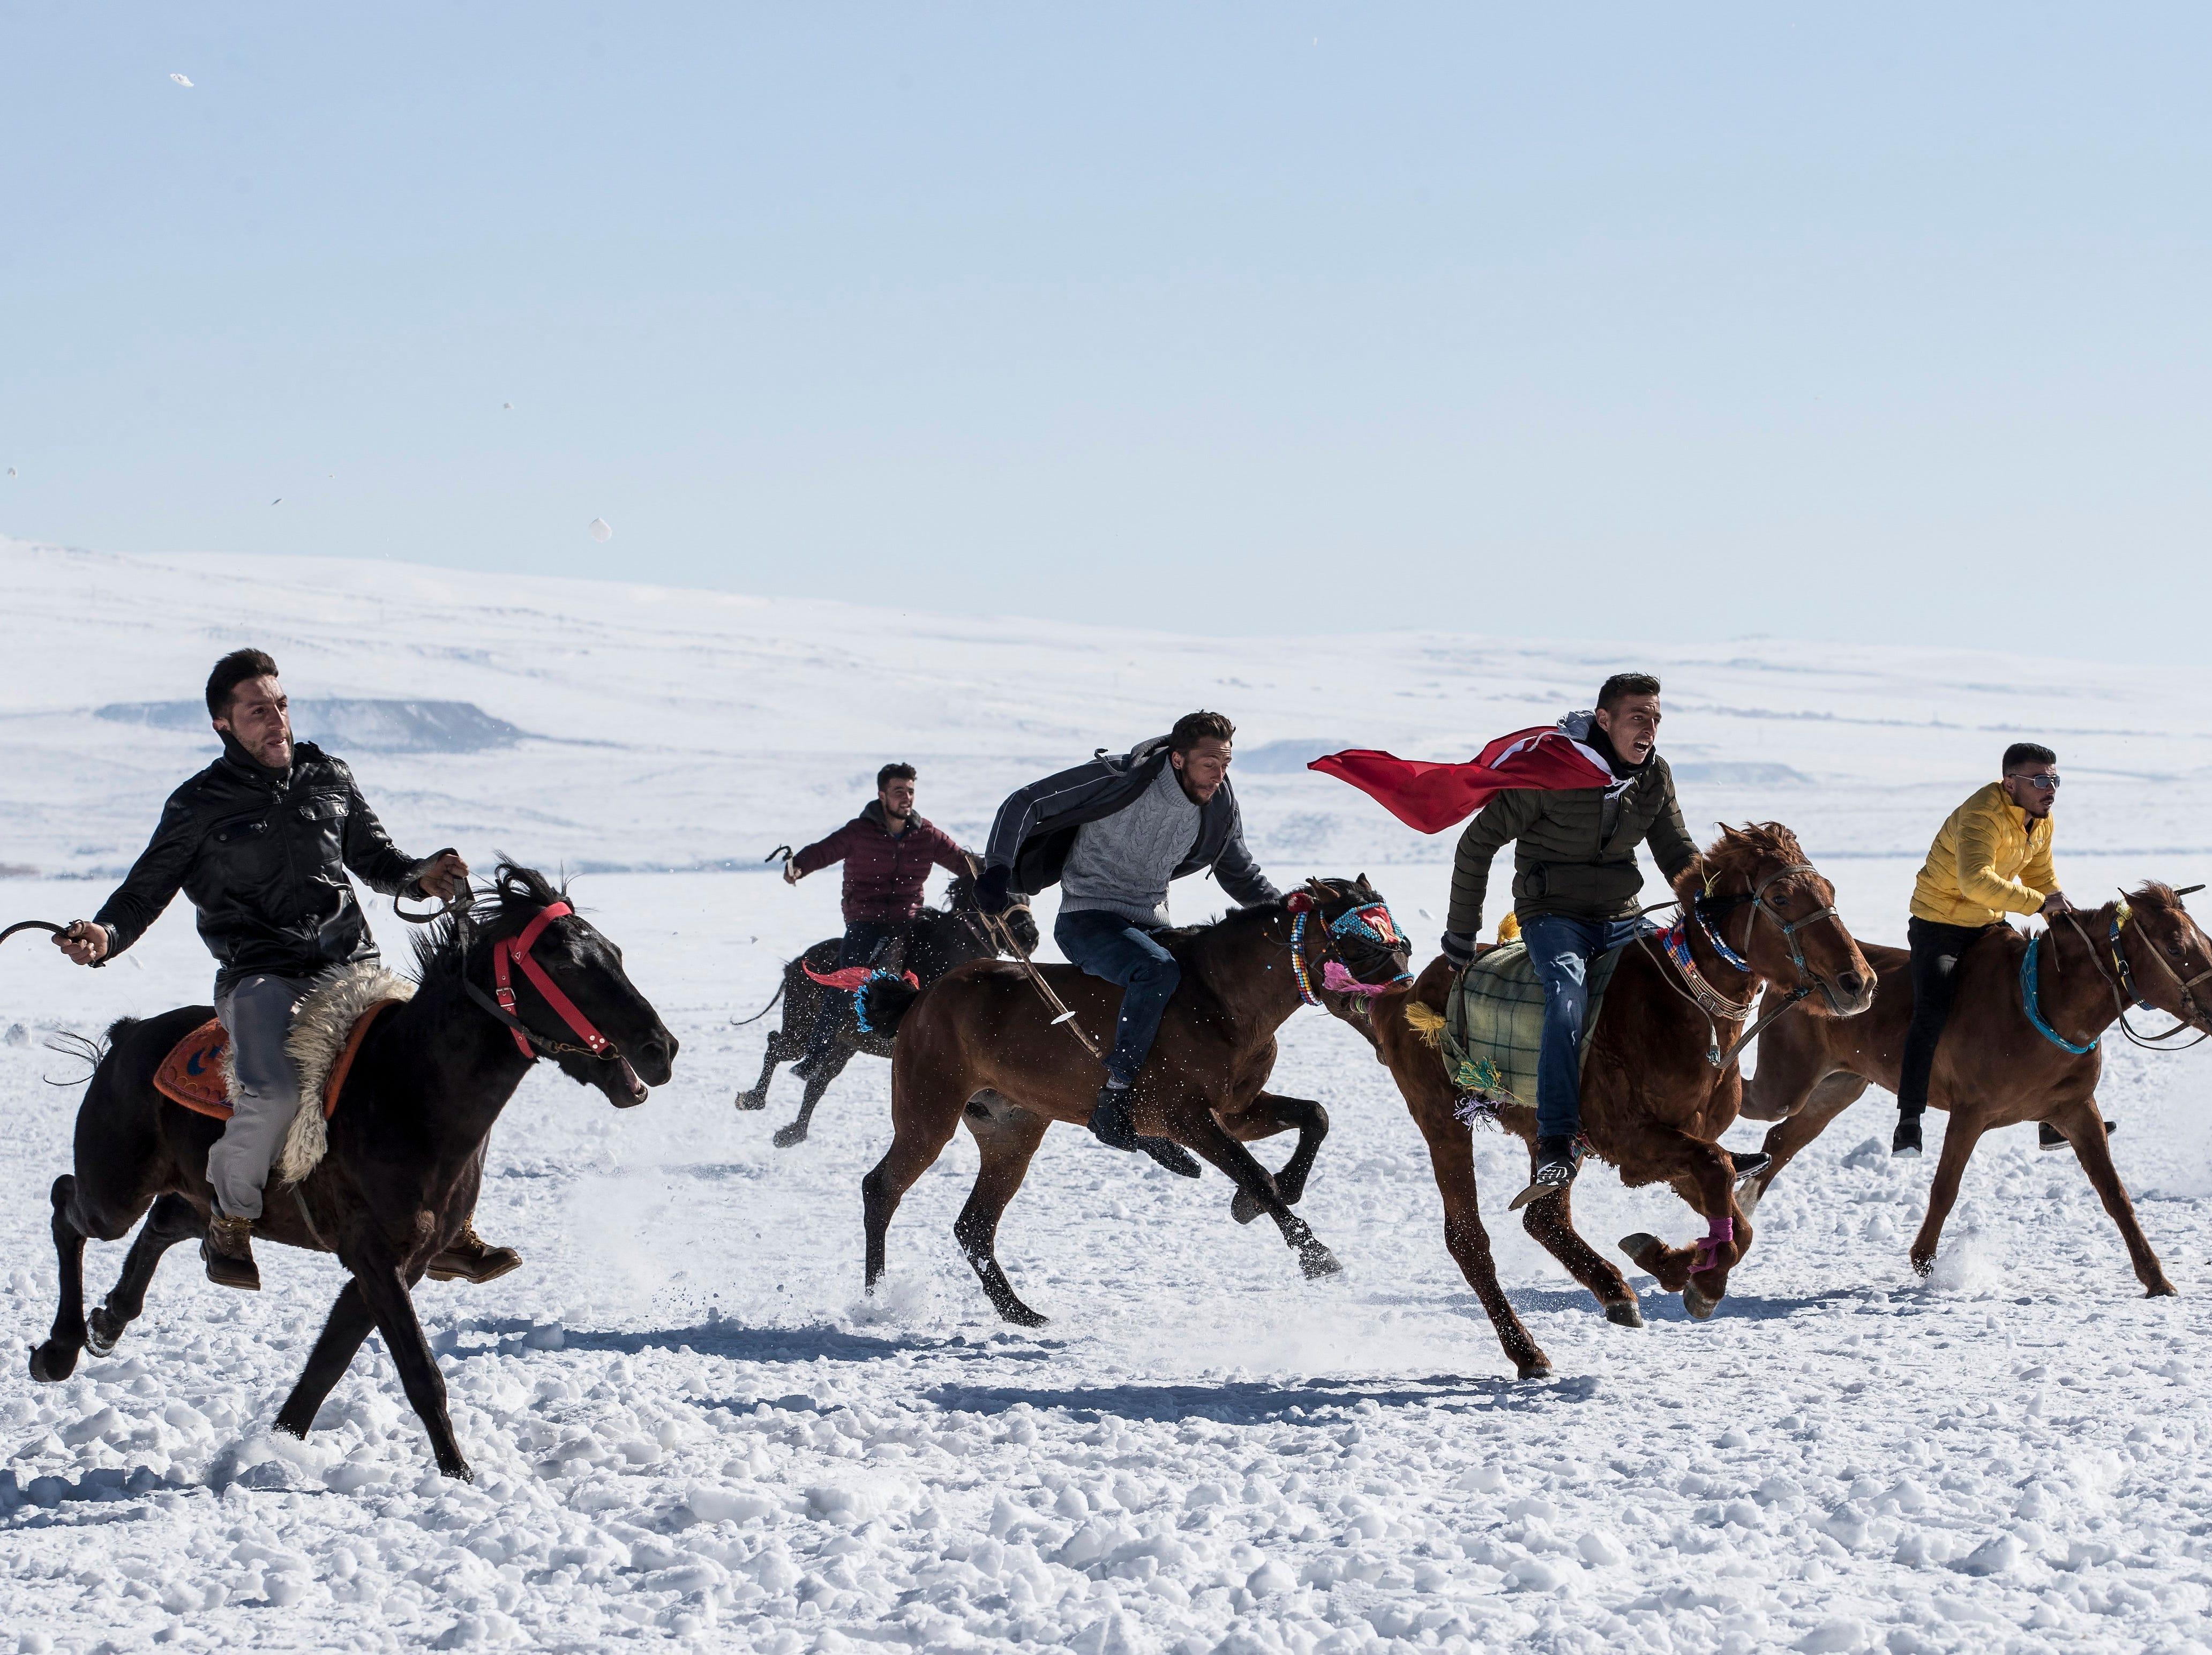 Feb. 10, 2018: Men take part in a horse race across the frozen Cildir Lake during the Cildir Lake Golden Horse Festival at Cildir Lake in Karst, Turkey.